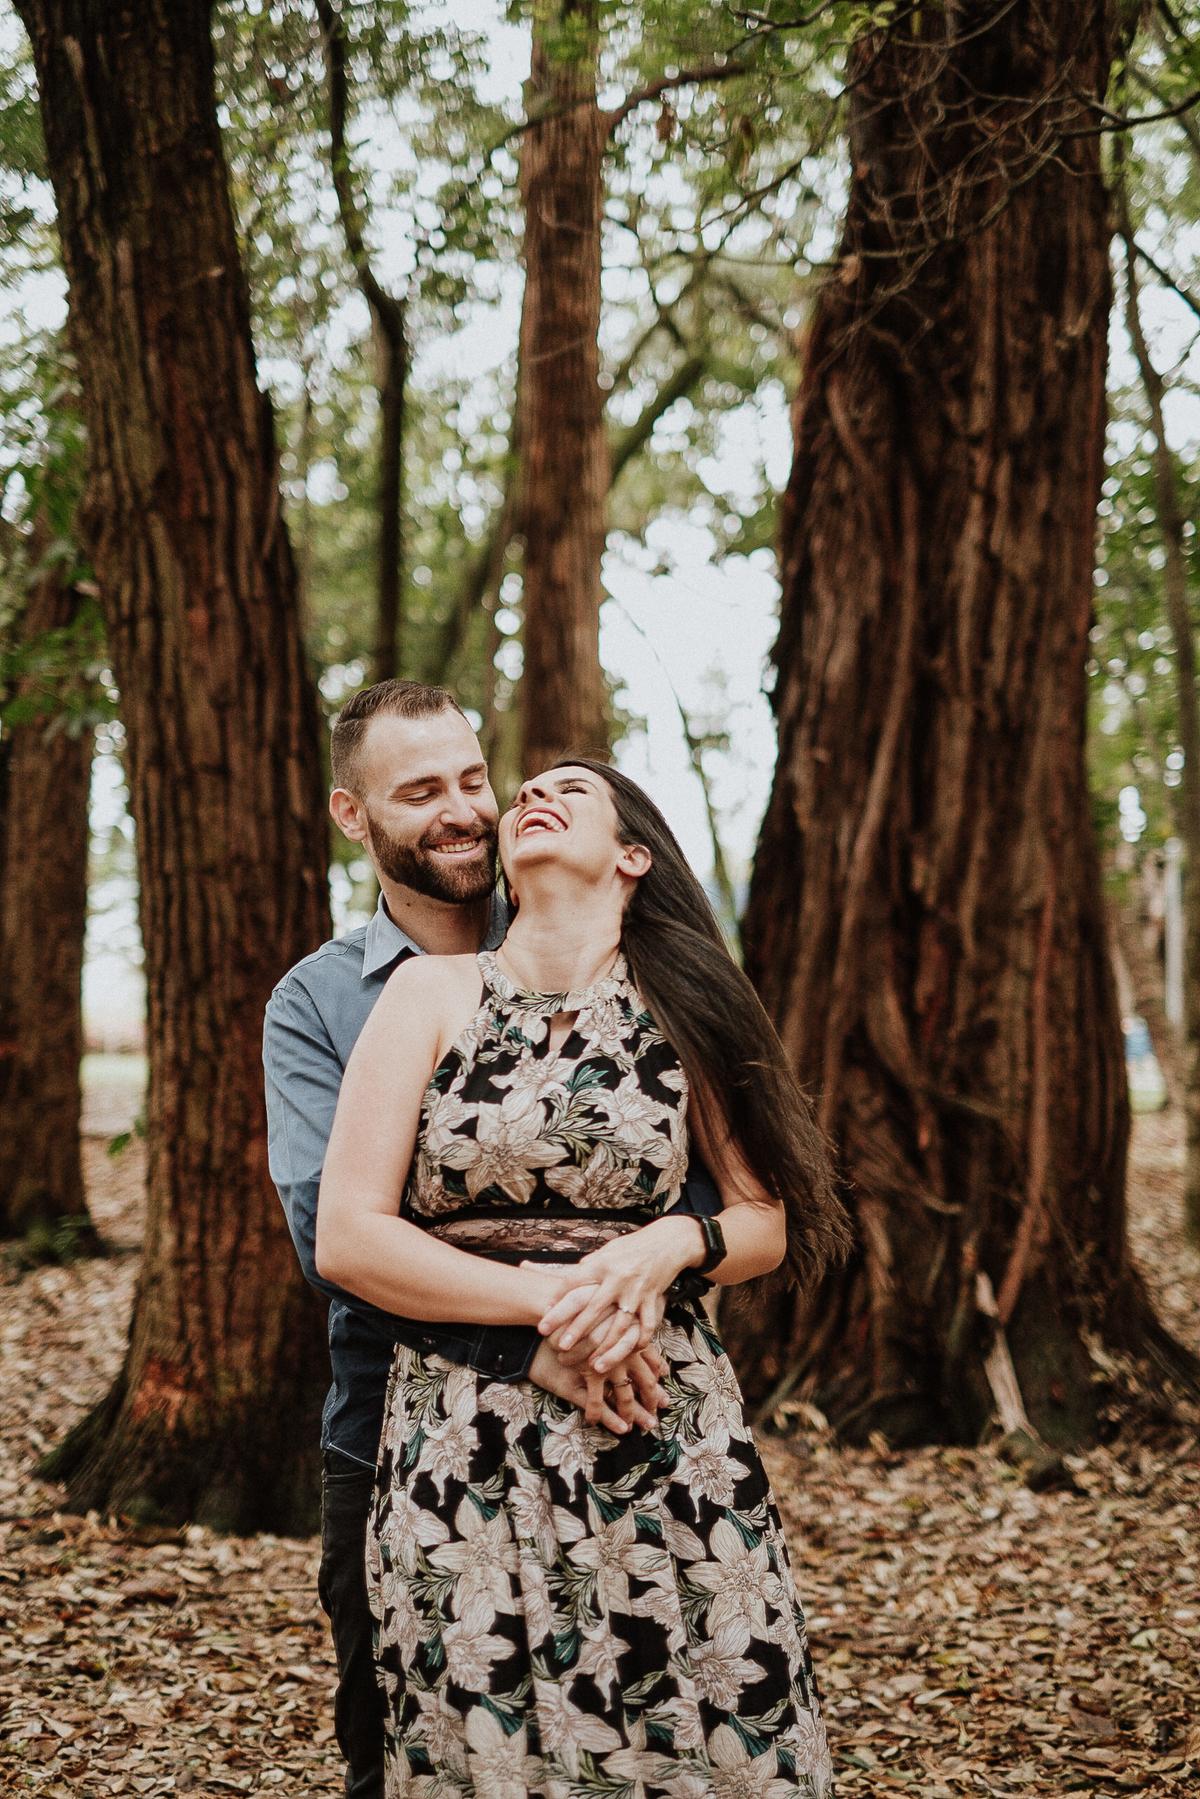 ensaio pre casamento fotografos de sao paulo ensaio no campo ensaio casal fotografos de casamentos autenticos elopement casamento intimista